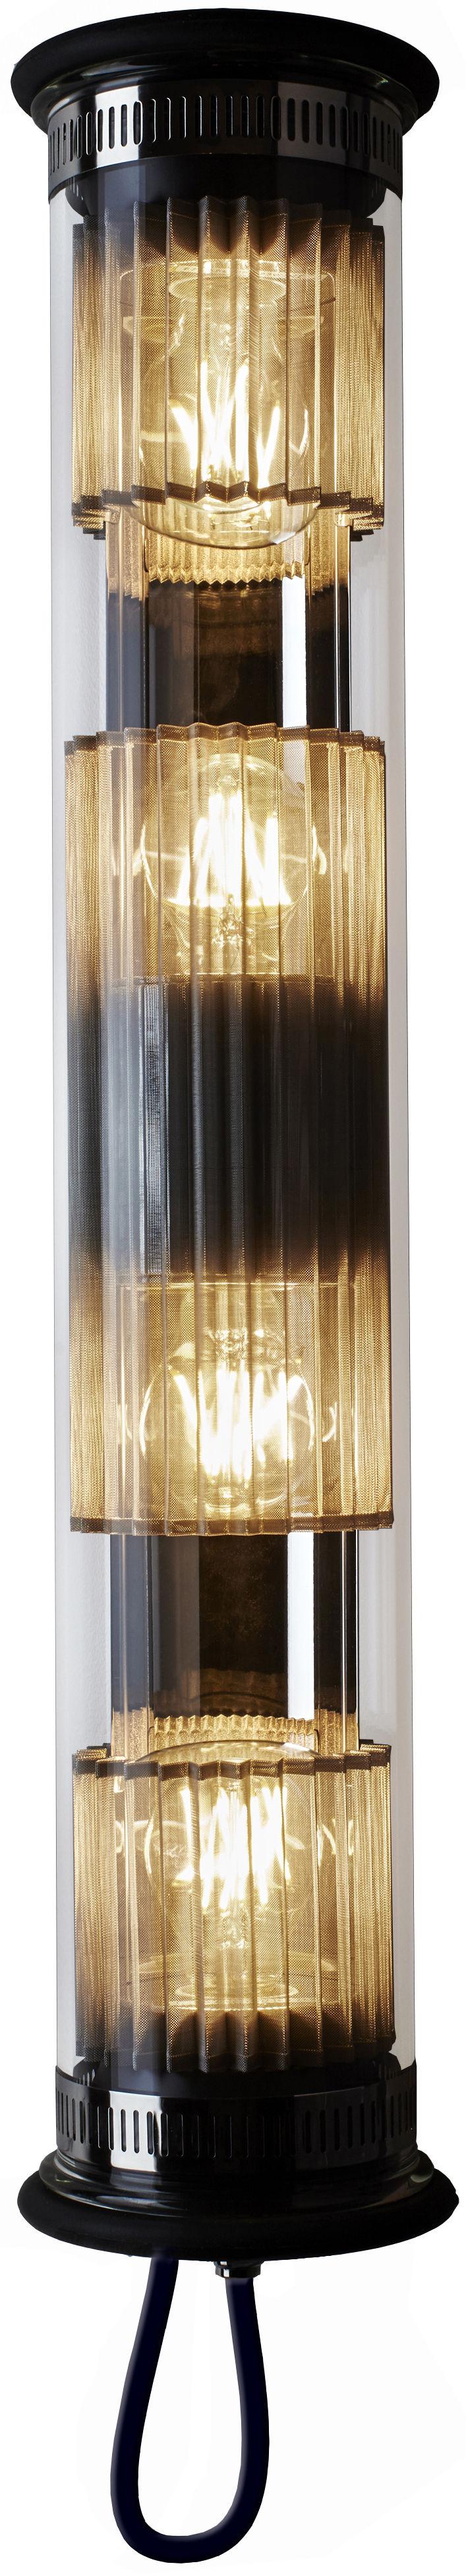 Leuchten - Wandleuchten - In The Tube 120-700 Outdoor-Wandleuchte / L 72 cm - DCW éditions - Silberfarben - rostfreier Stahl, Verre borosilicaté